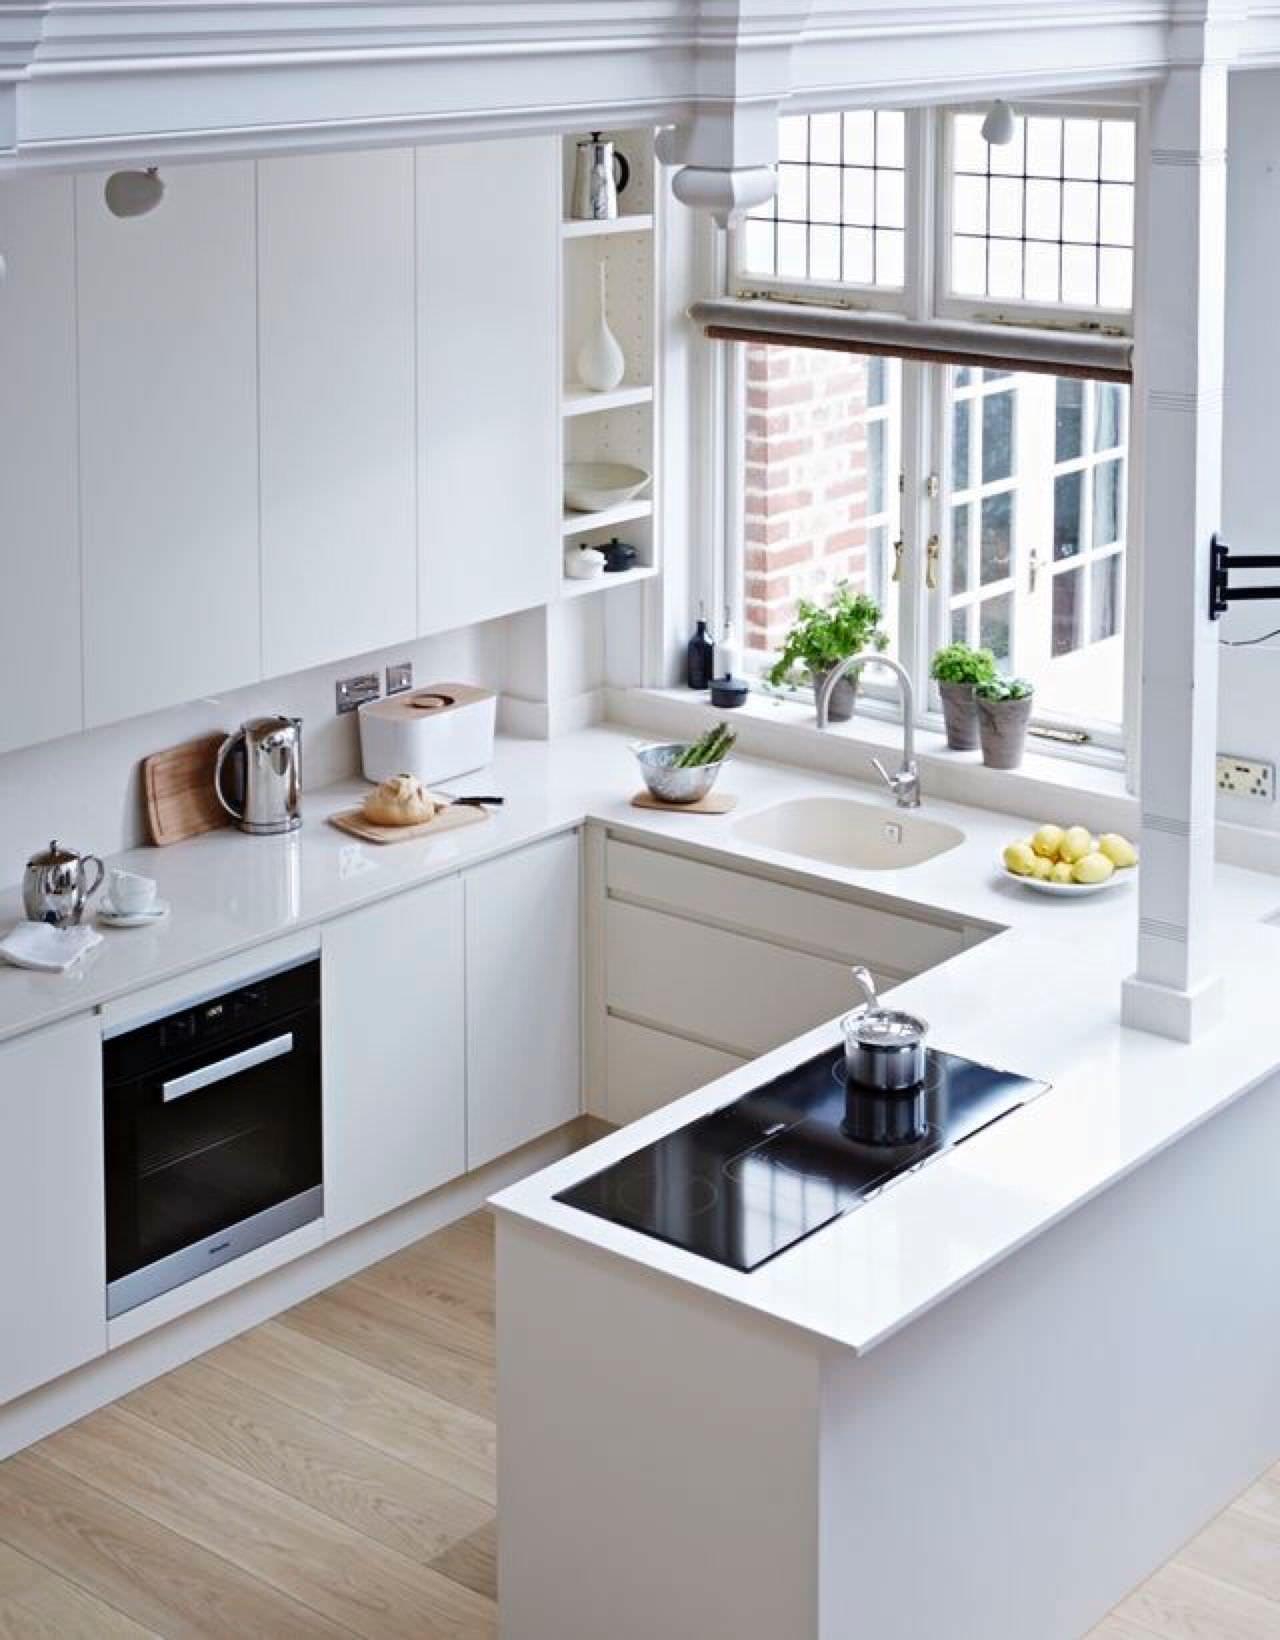 100 idee cucine moderne • Stile e design per la cucina